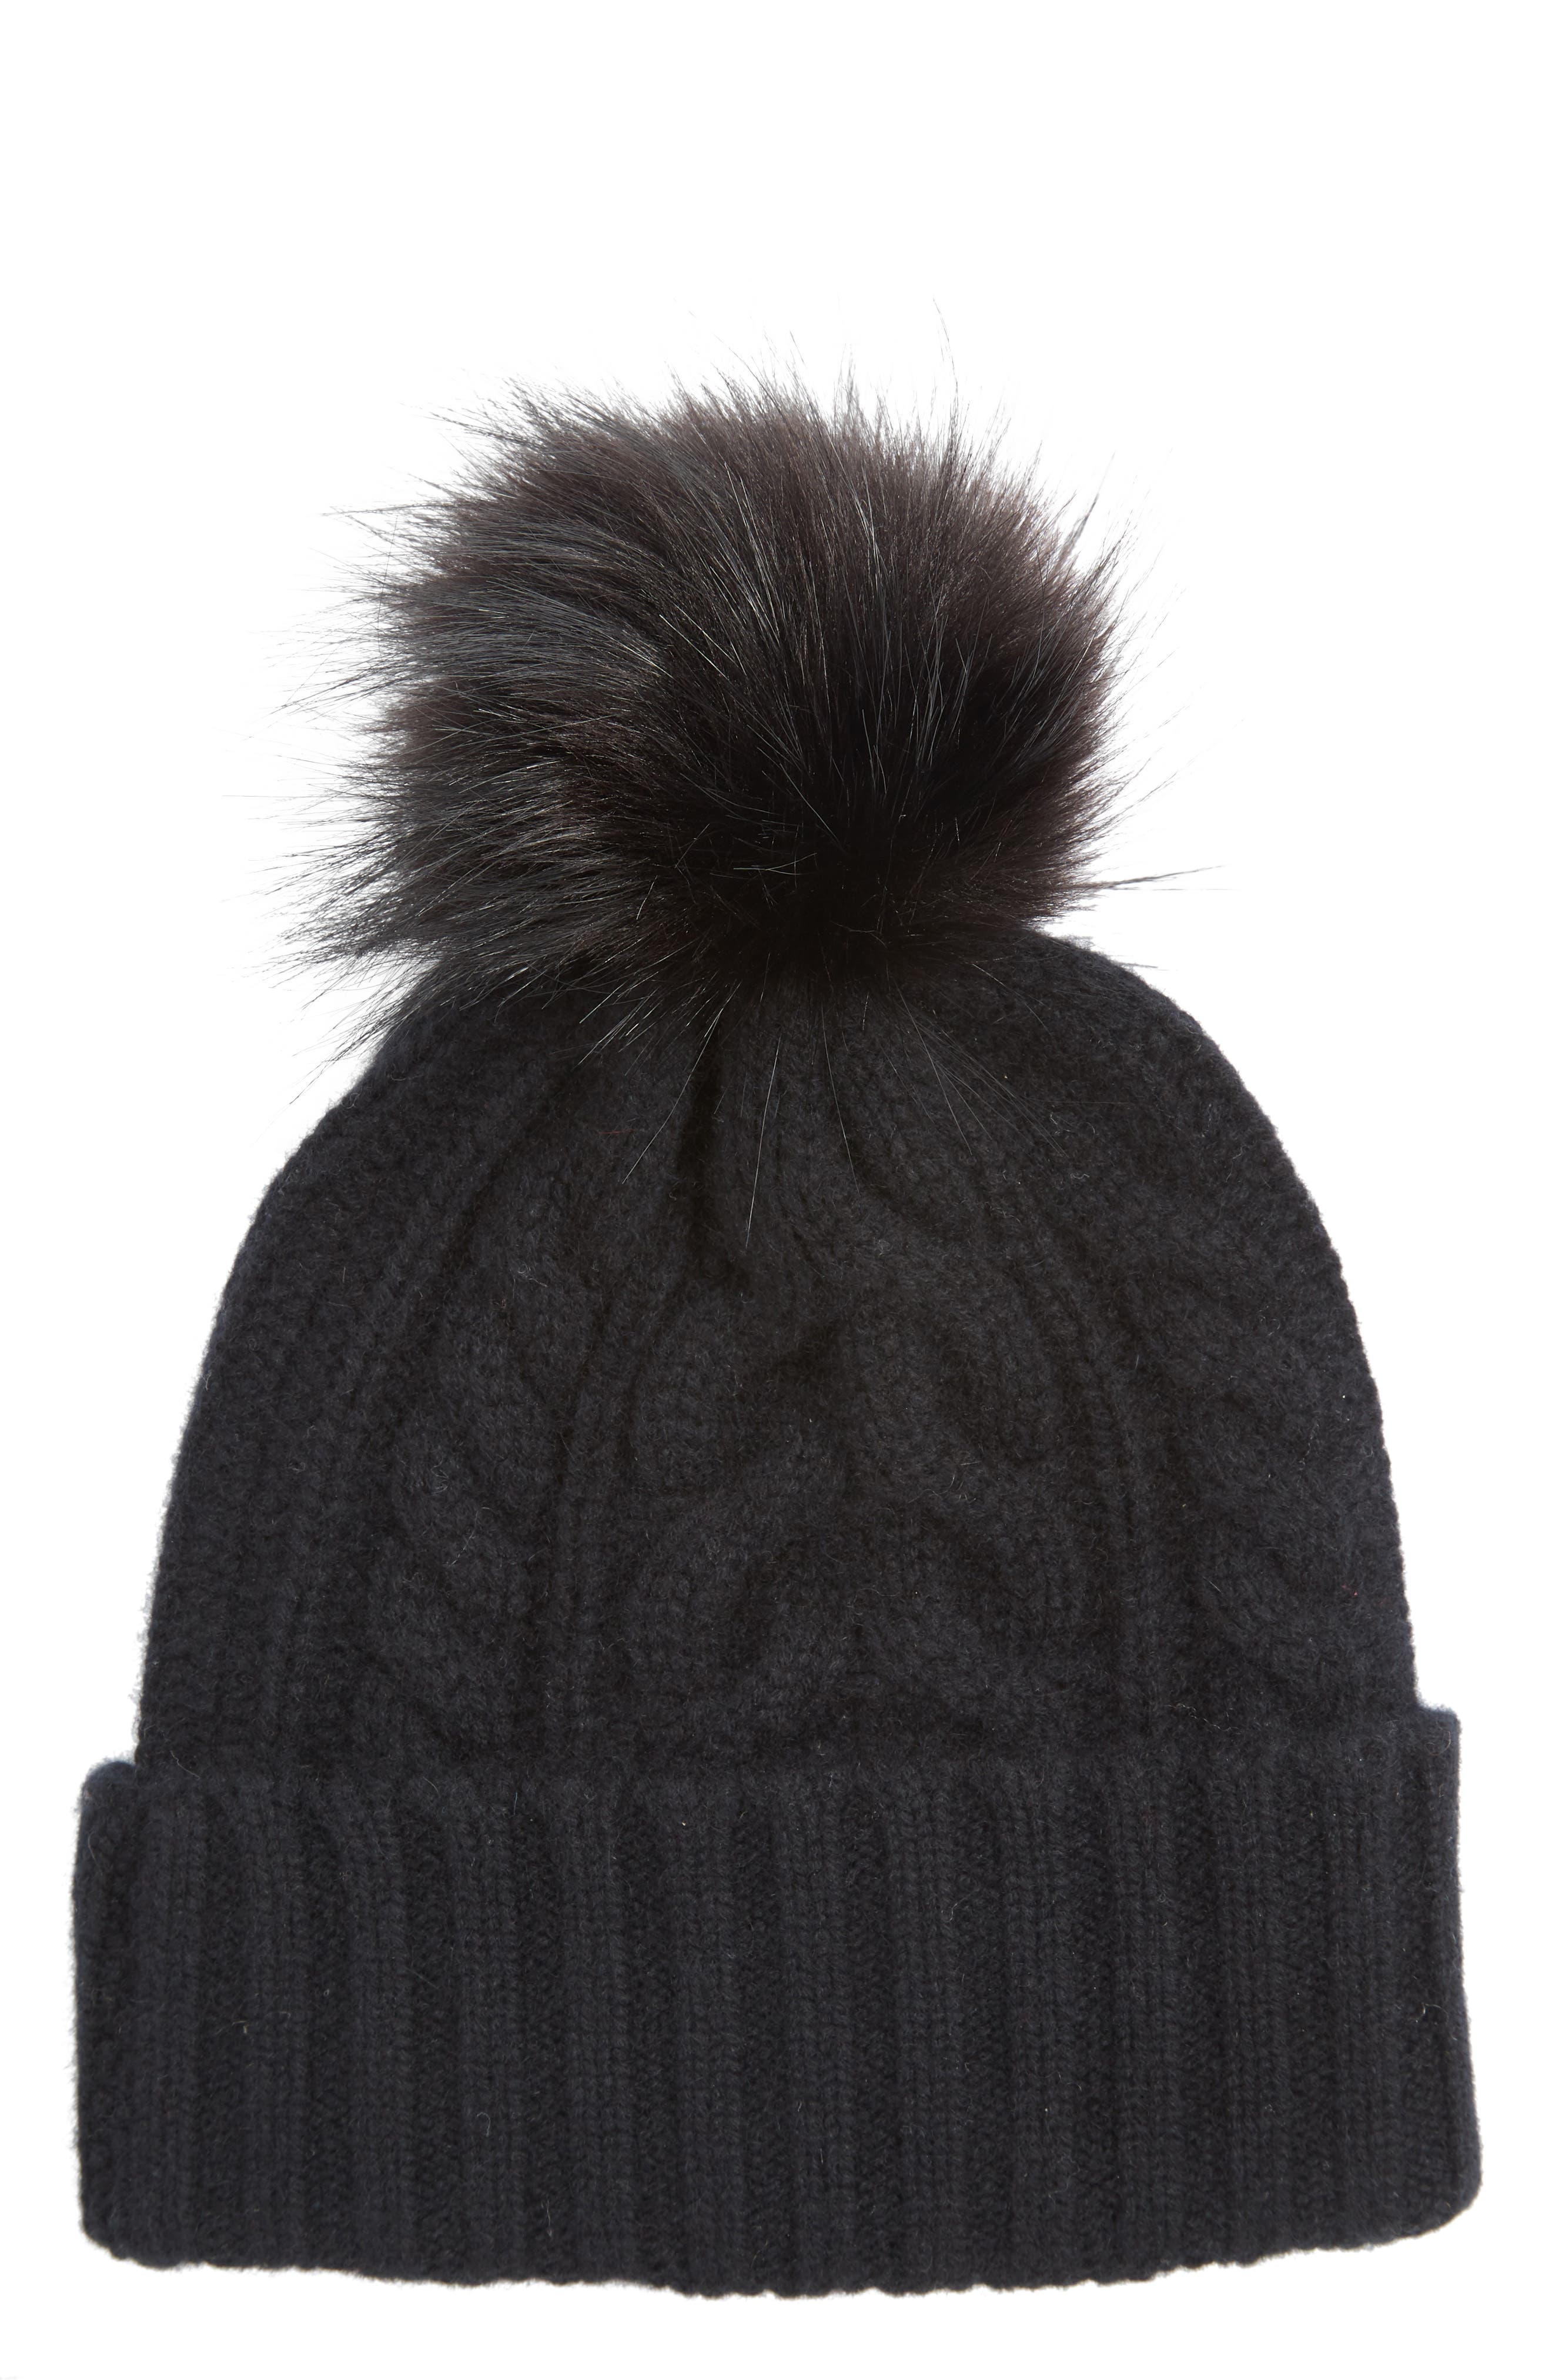 HALOGEN<SUP>®</SUP> Cashmere Cable Knit Beanie with Faux Fur Pom, Main, color, 001